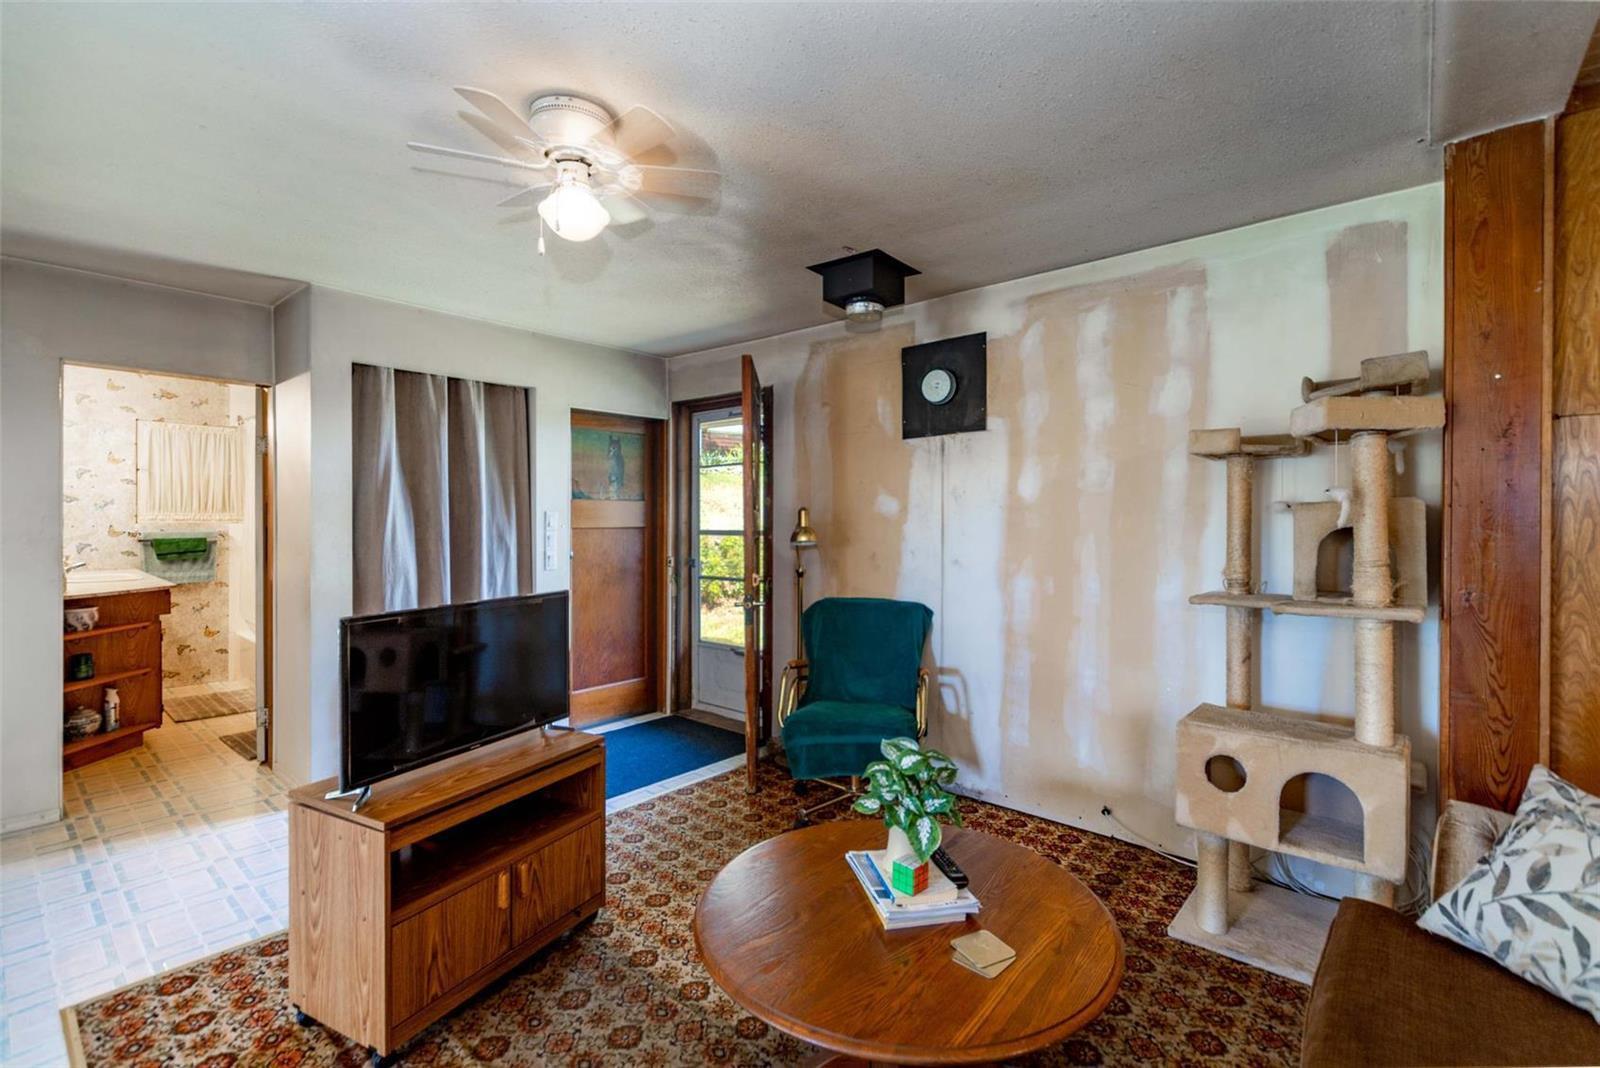 4602 Schubert Road,, Armstrong, British Columbia  V0E 1B4 - Photo 22 - 10232683